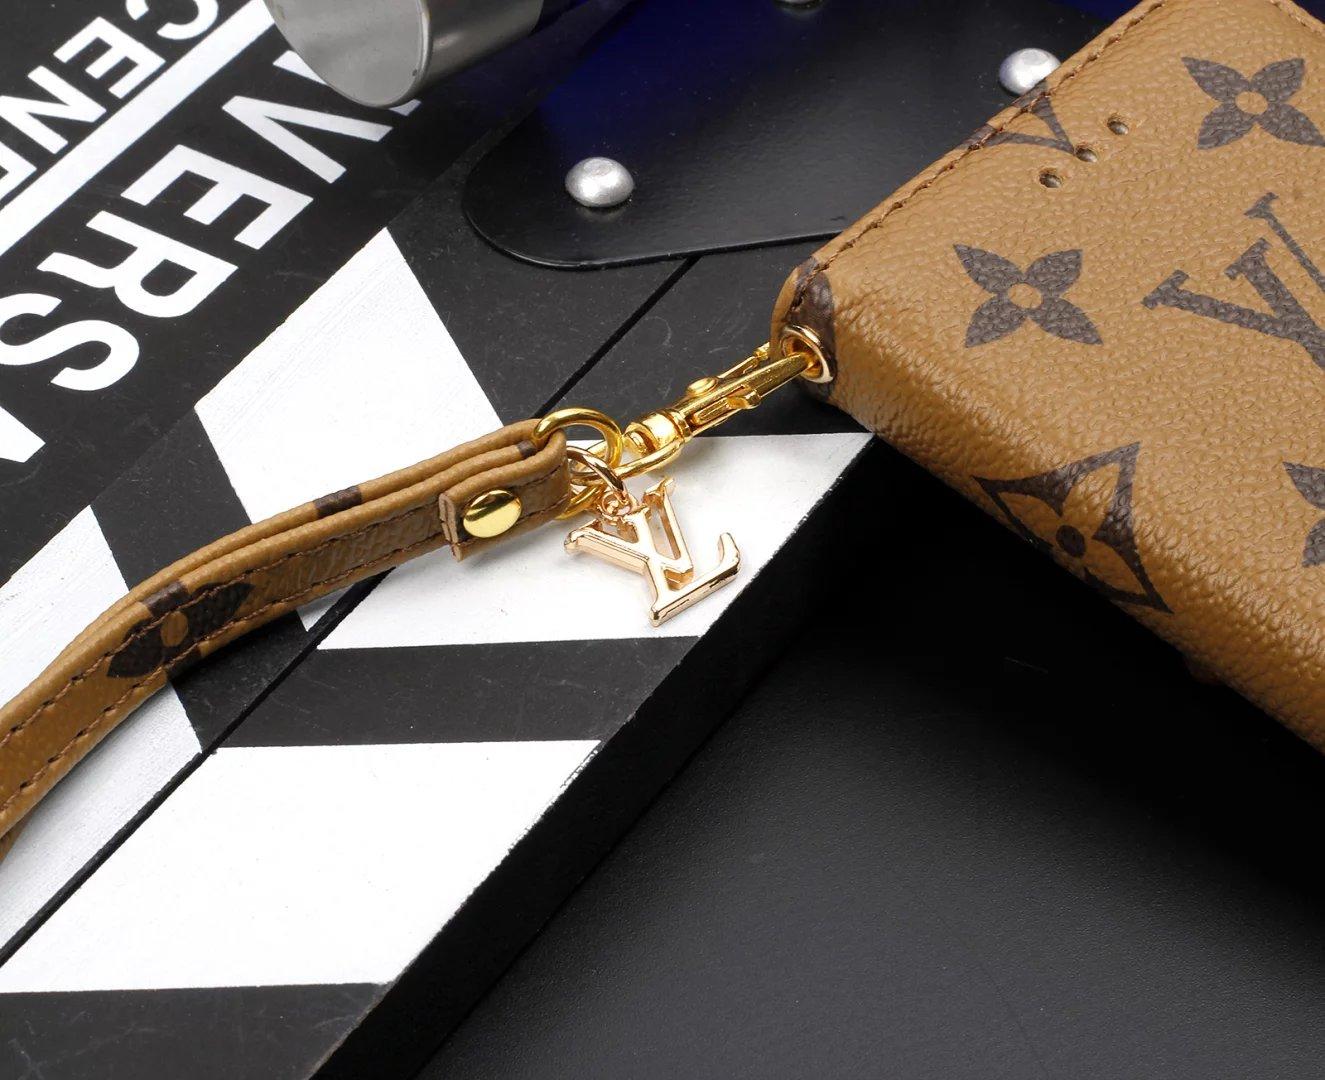 handyhülle iphone iphone case gestalten Louis Vuitton iphone6 hülle fotogeschenke handyhülle handyhülle drucken handy ca6 foto schutzhülle designen iphone bumper 6lbst gestalten iphone ca6 kaufen